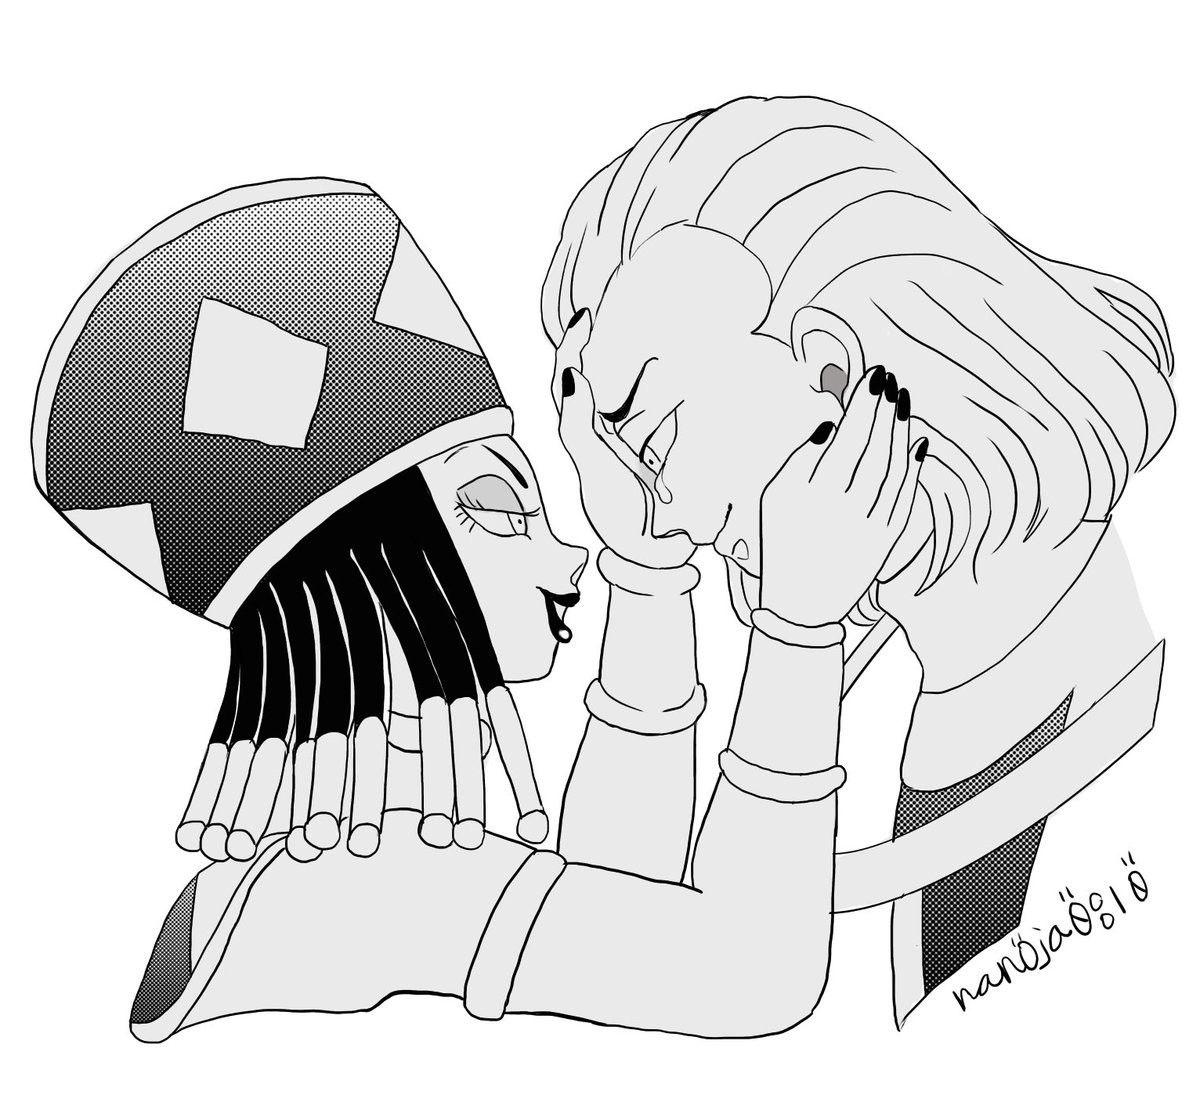 Pin by Versaly Hernandez on Dragon Ball   Pinterest   Dragon ball ...